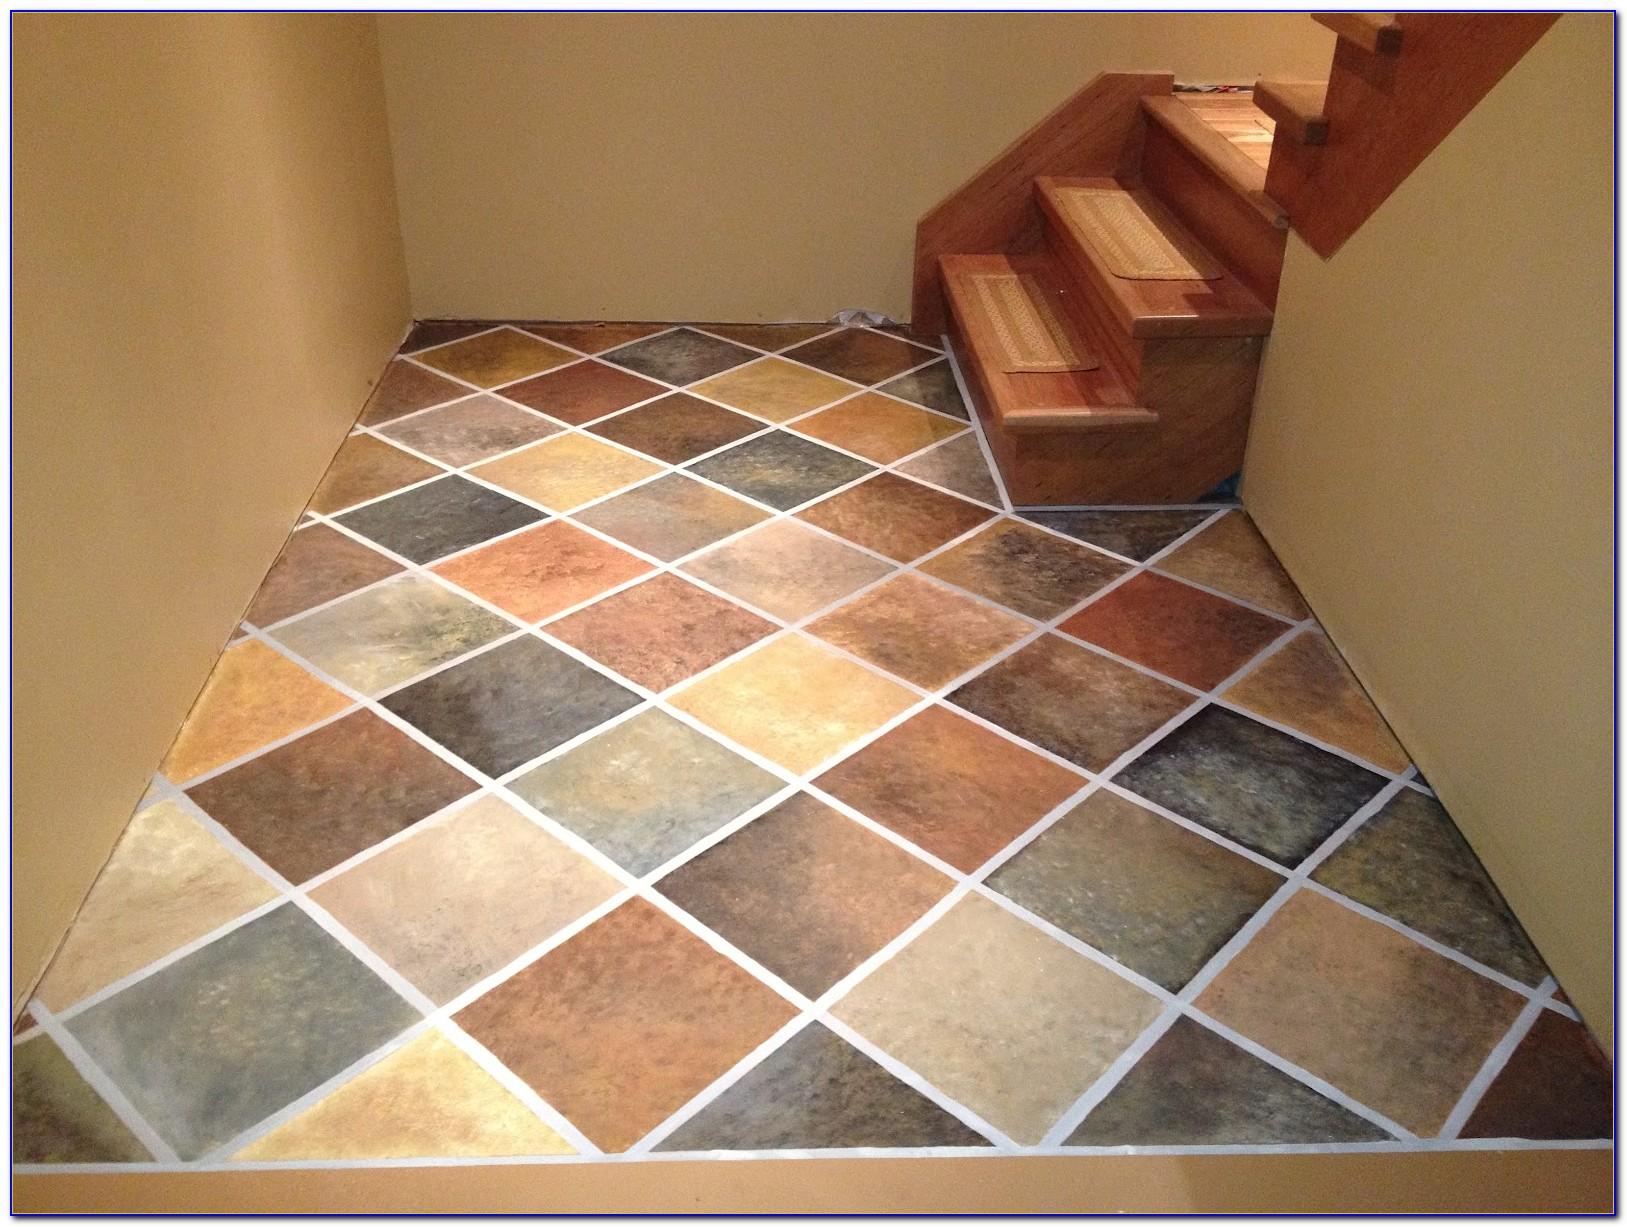 Paint Ceramic Tile Floor To Look Like Wood